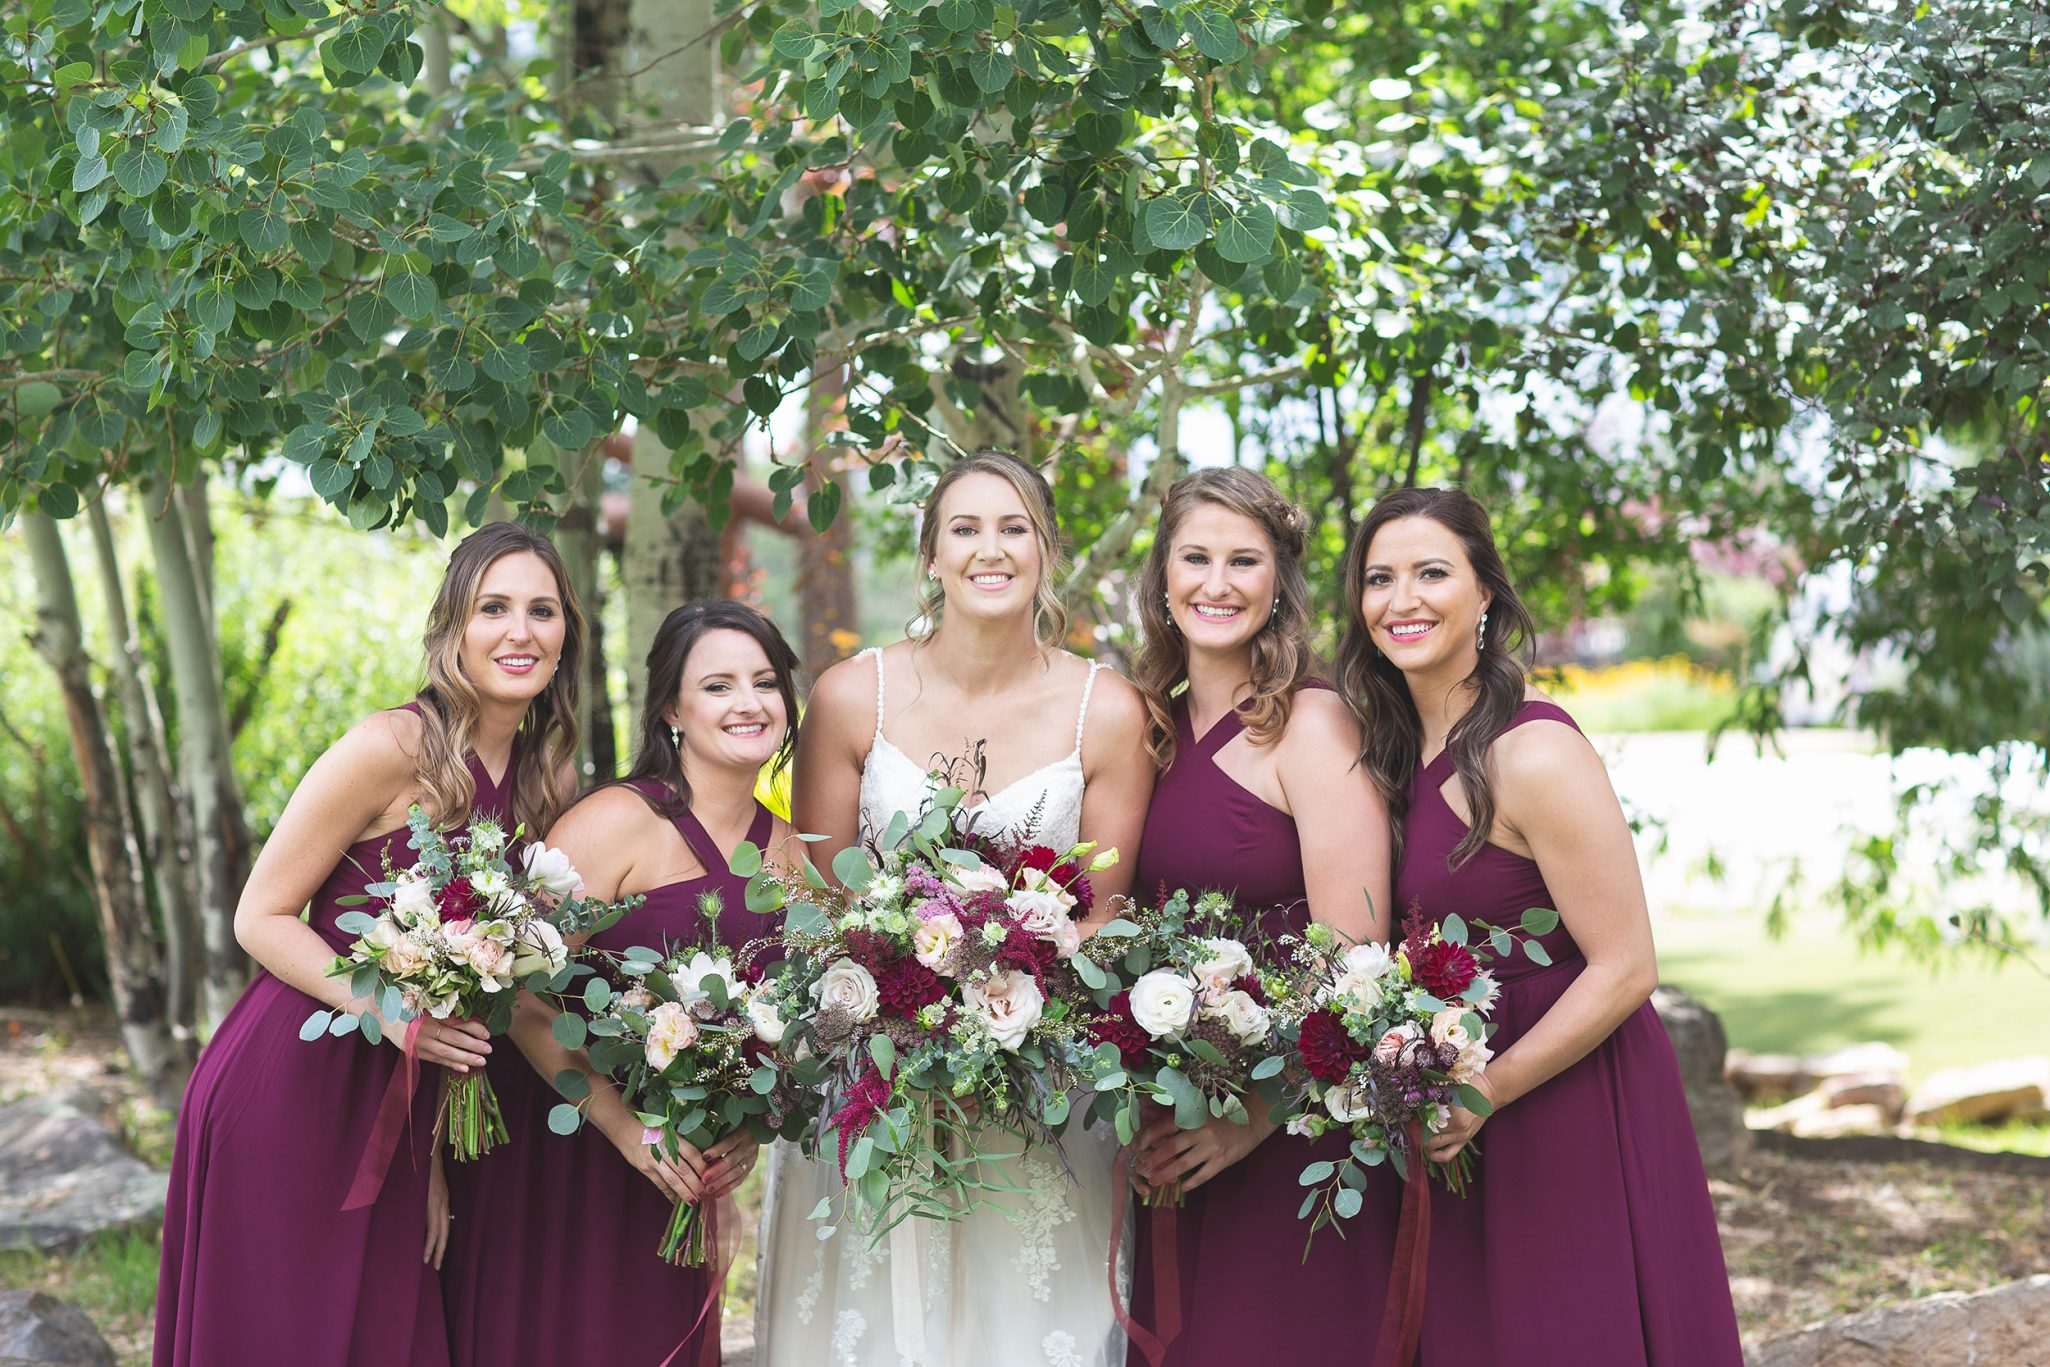 Florals by April's Garden Weddings